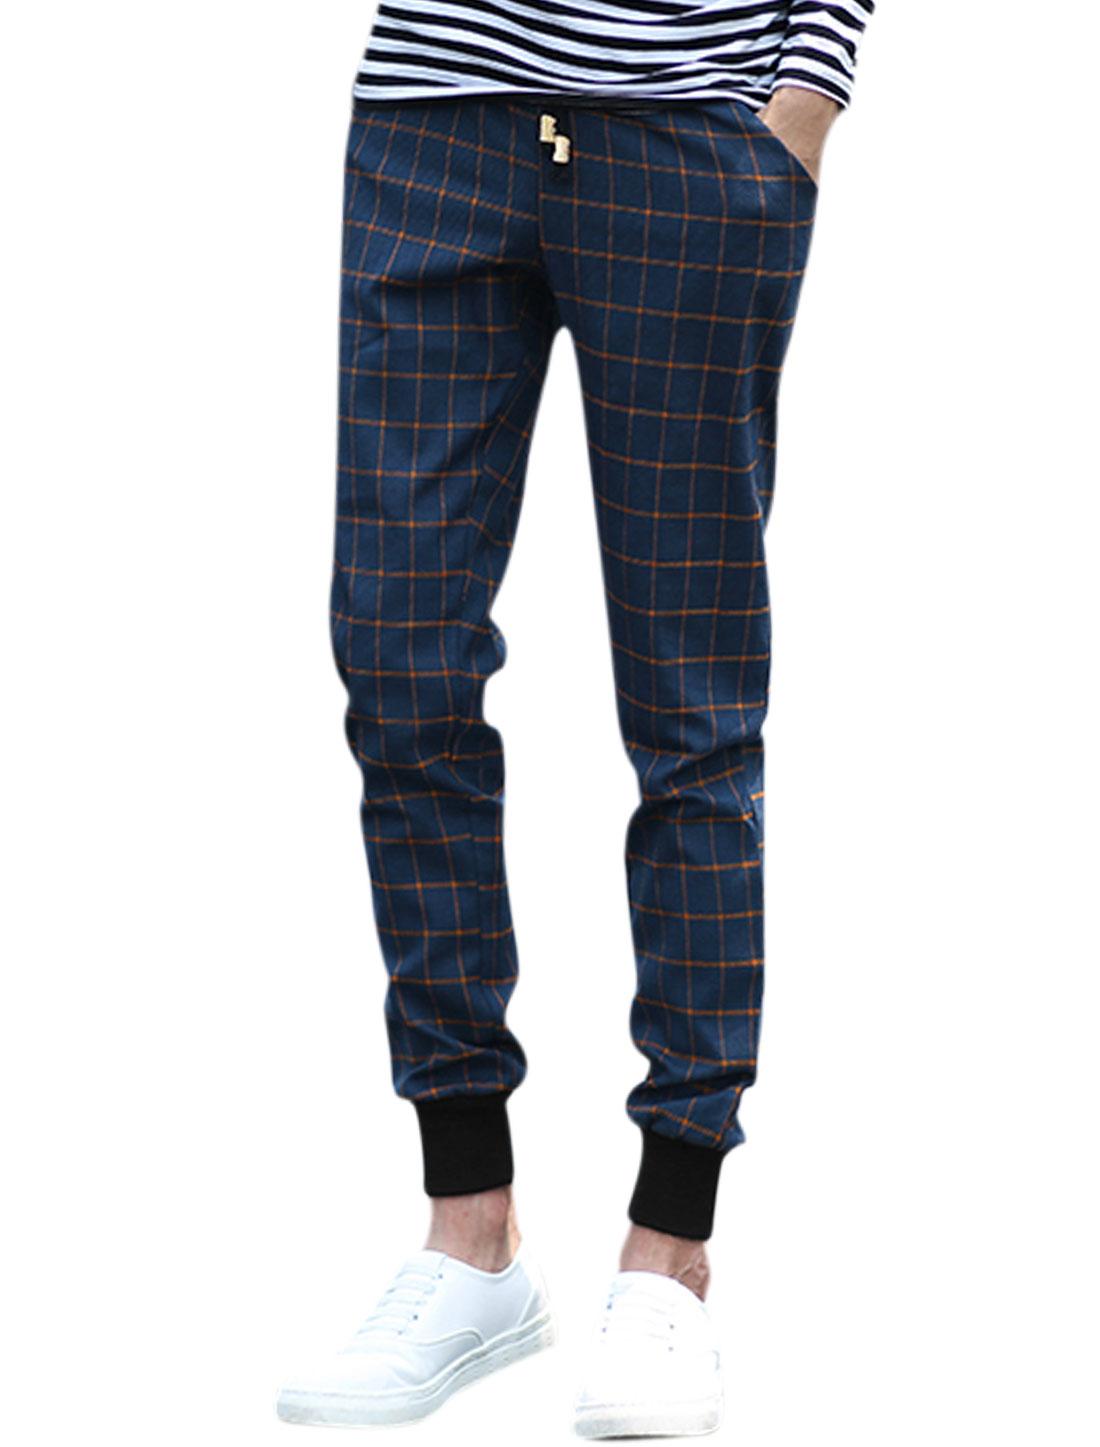 Men Drawstring Waist Plaids Front Pockets Leisure Pants Blue W30